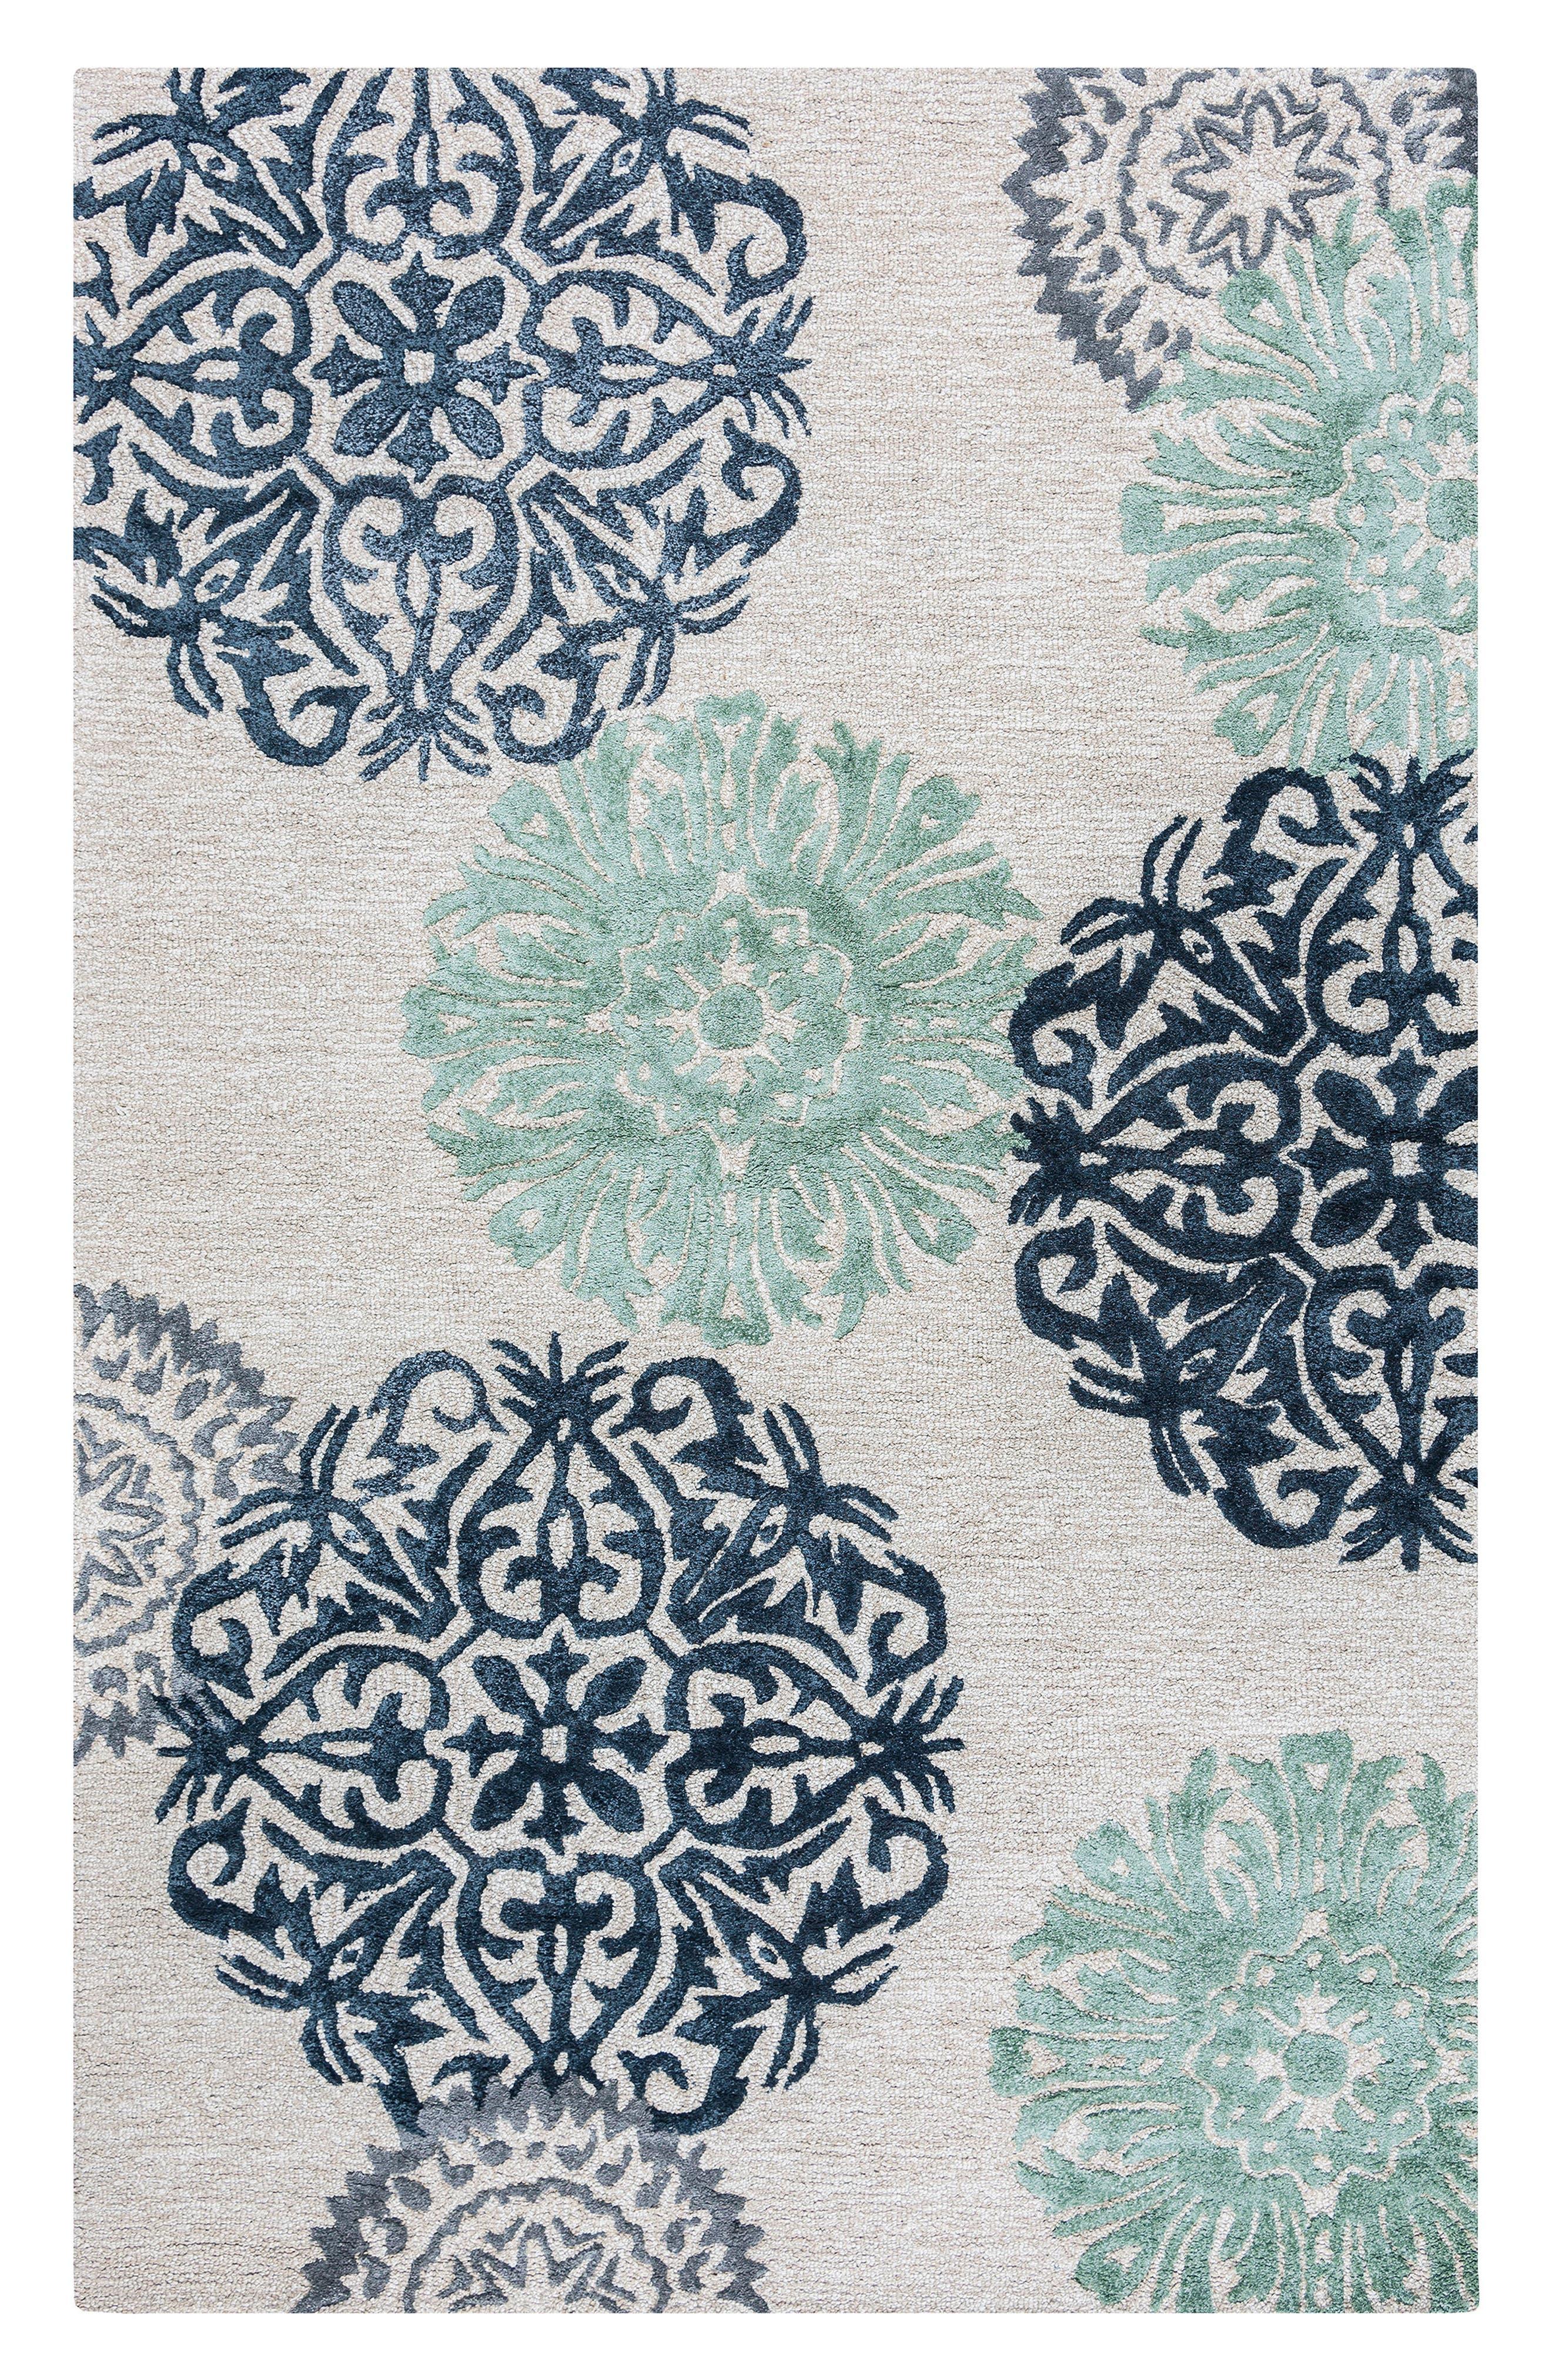 'Eden Harbor' Hand Tufted Wool Area Rug,                         Main,                         color, Navy/ Aqua/ Grey